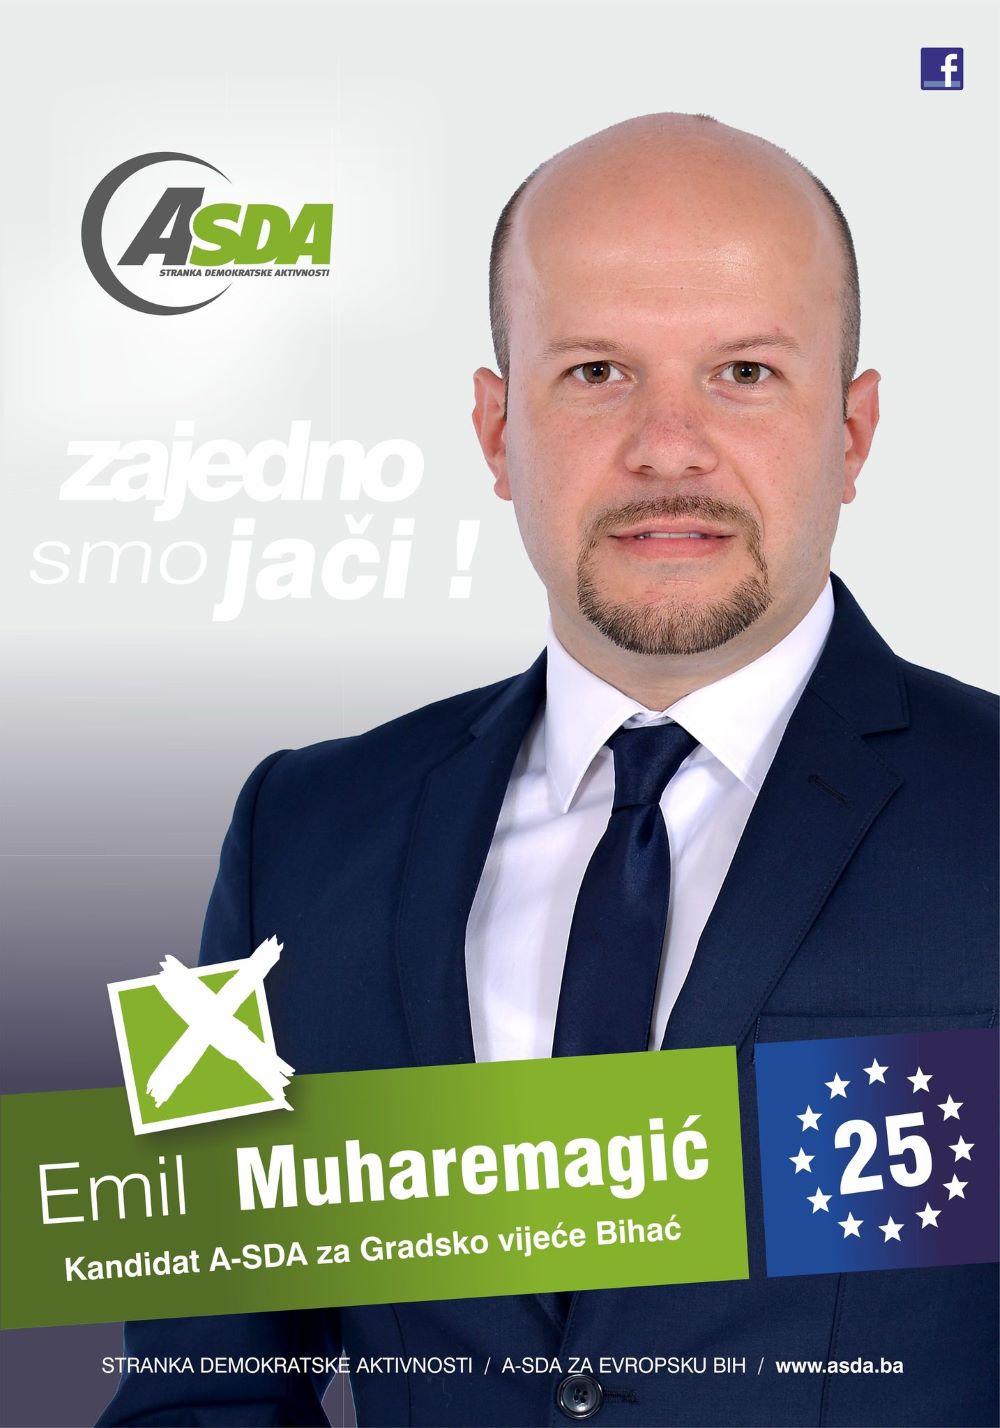 Emil Muharemagić